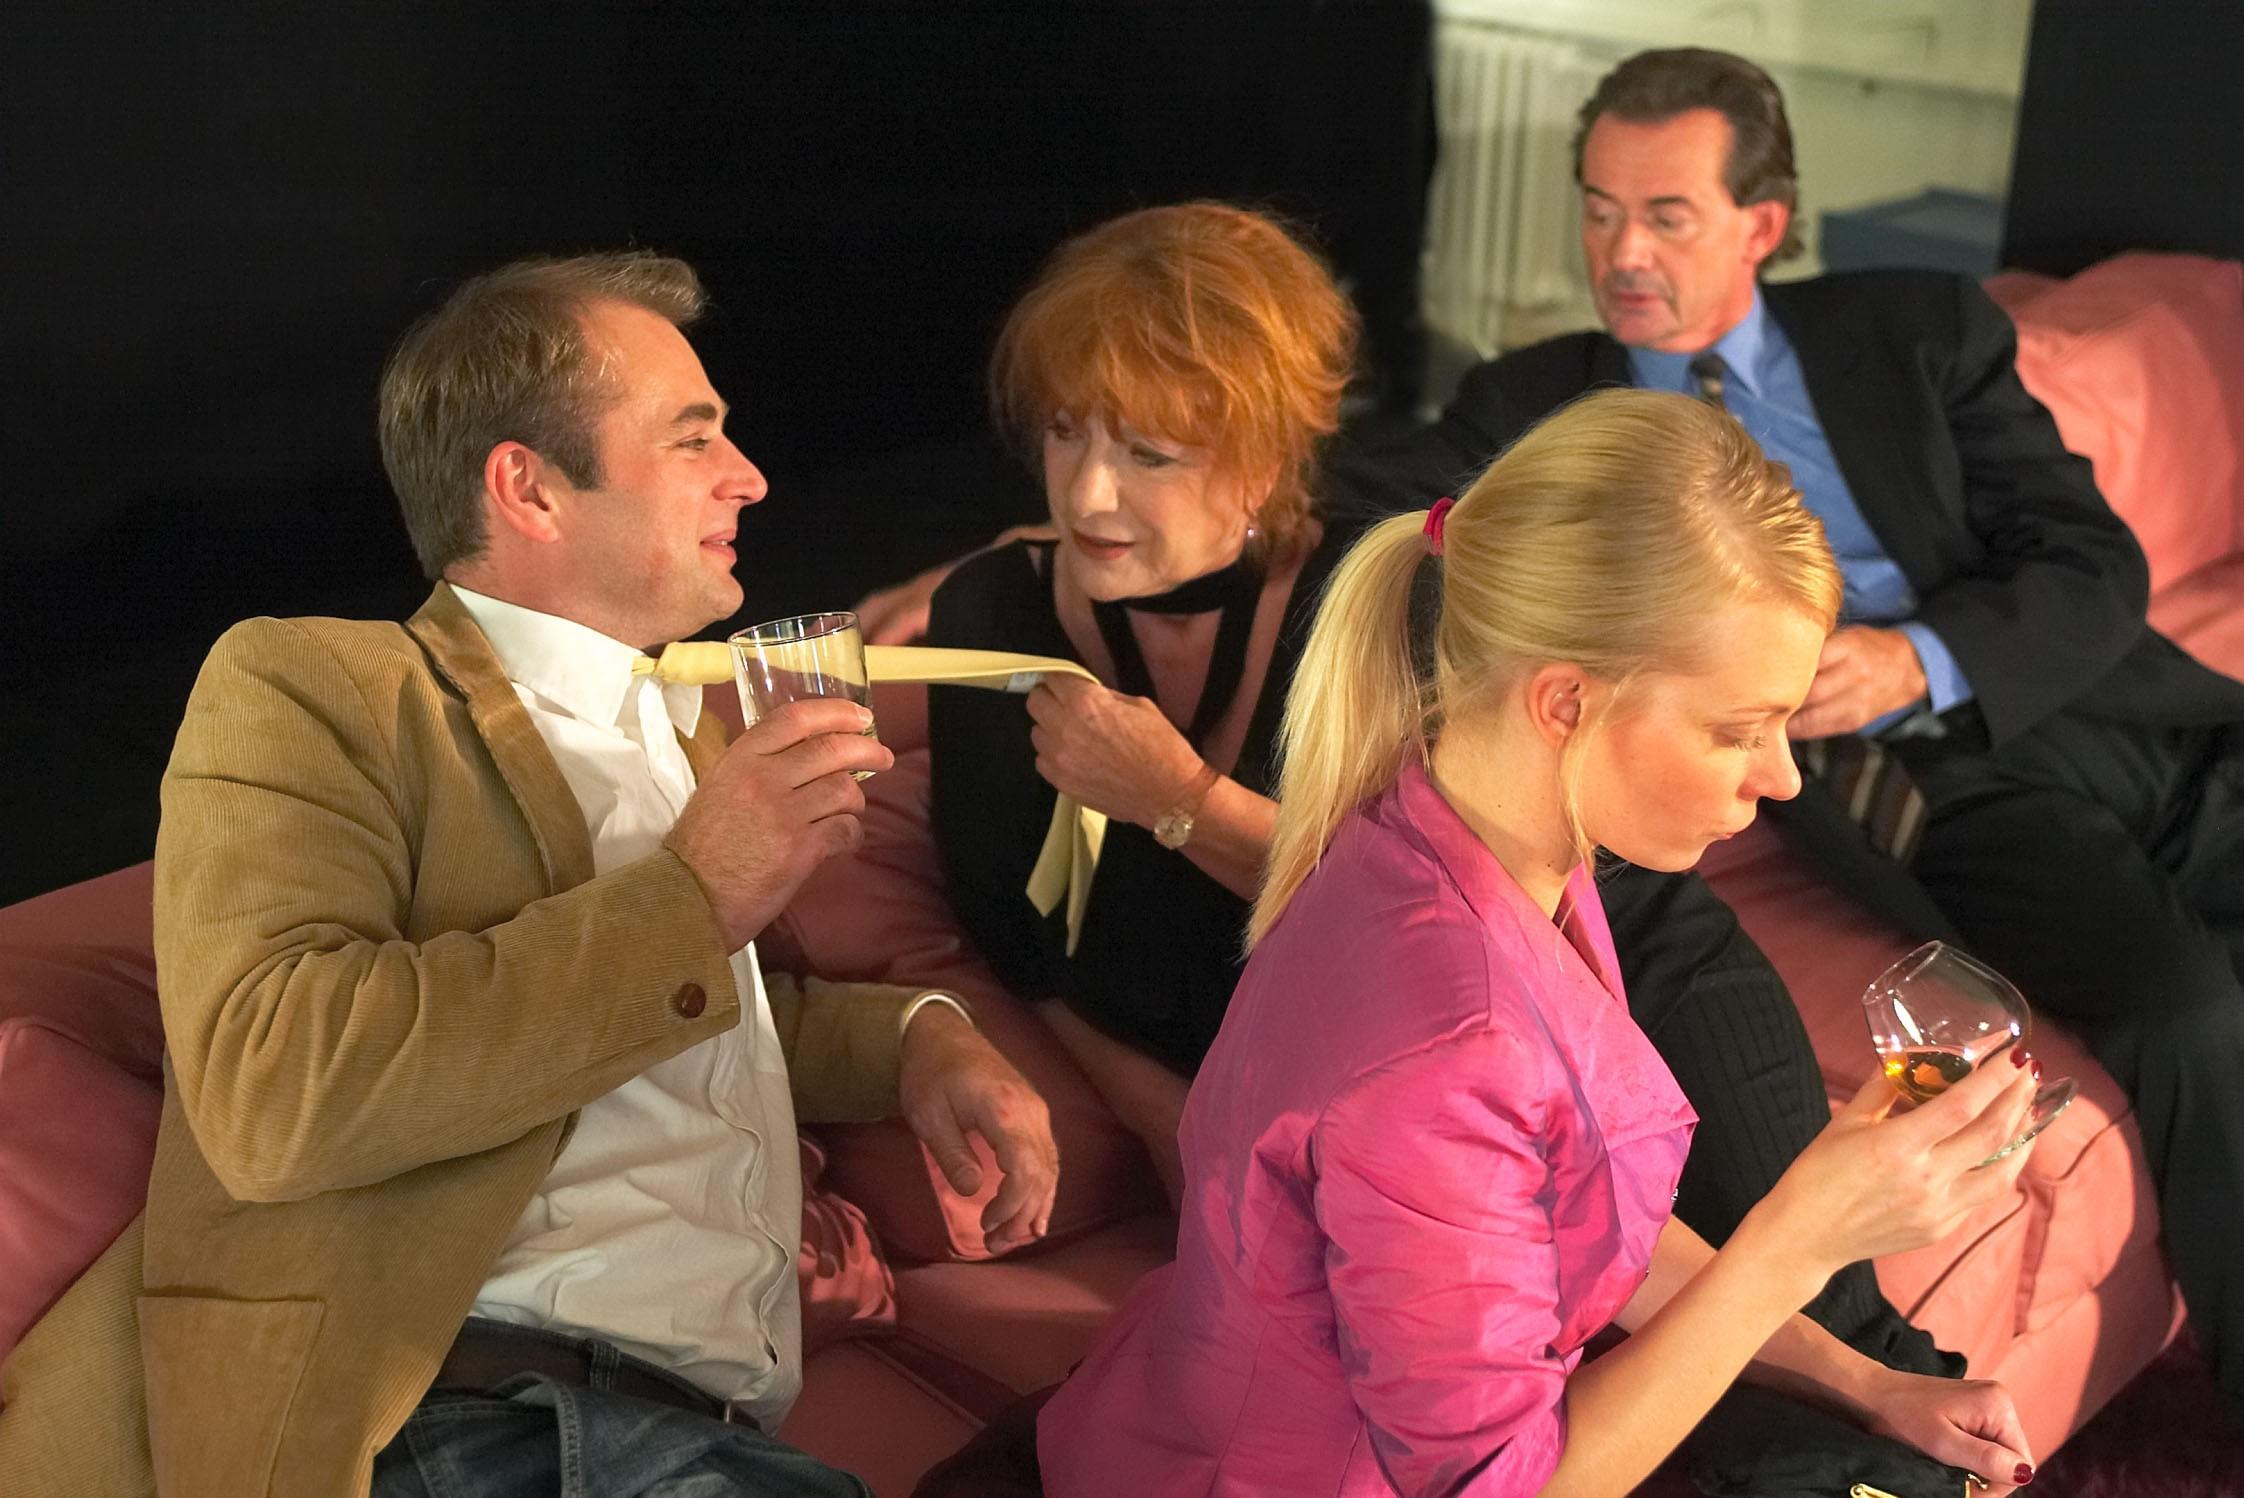 Wer hat Angst vor Virginia Woolf? v.l.n.r.: Gerd Böckmann, Hannelore Hoger, Marcus Bluhm © Brinkhoff / Mögenburg